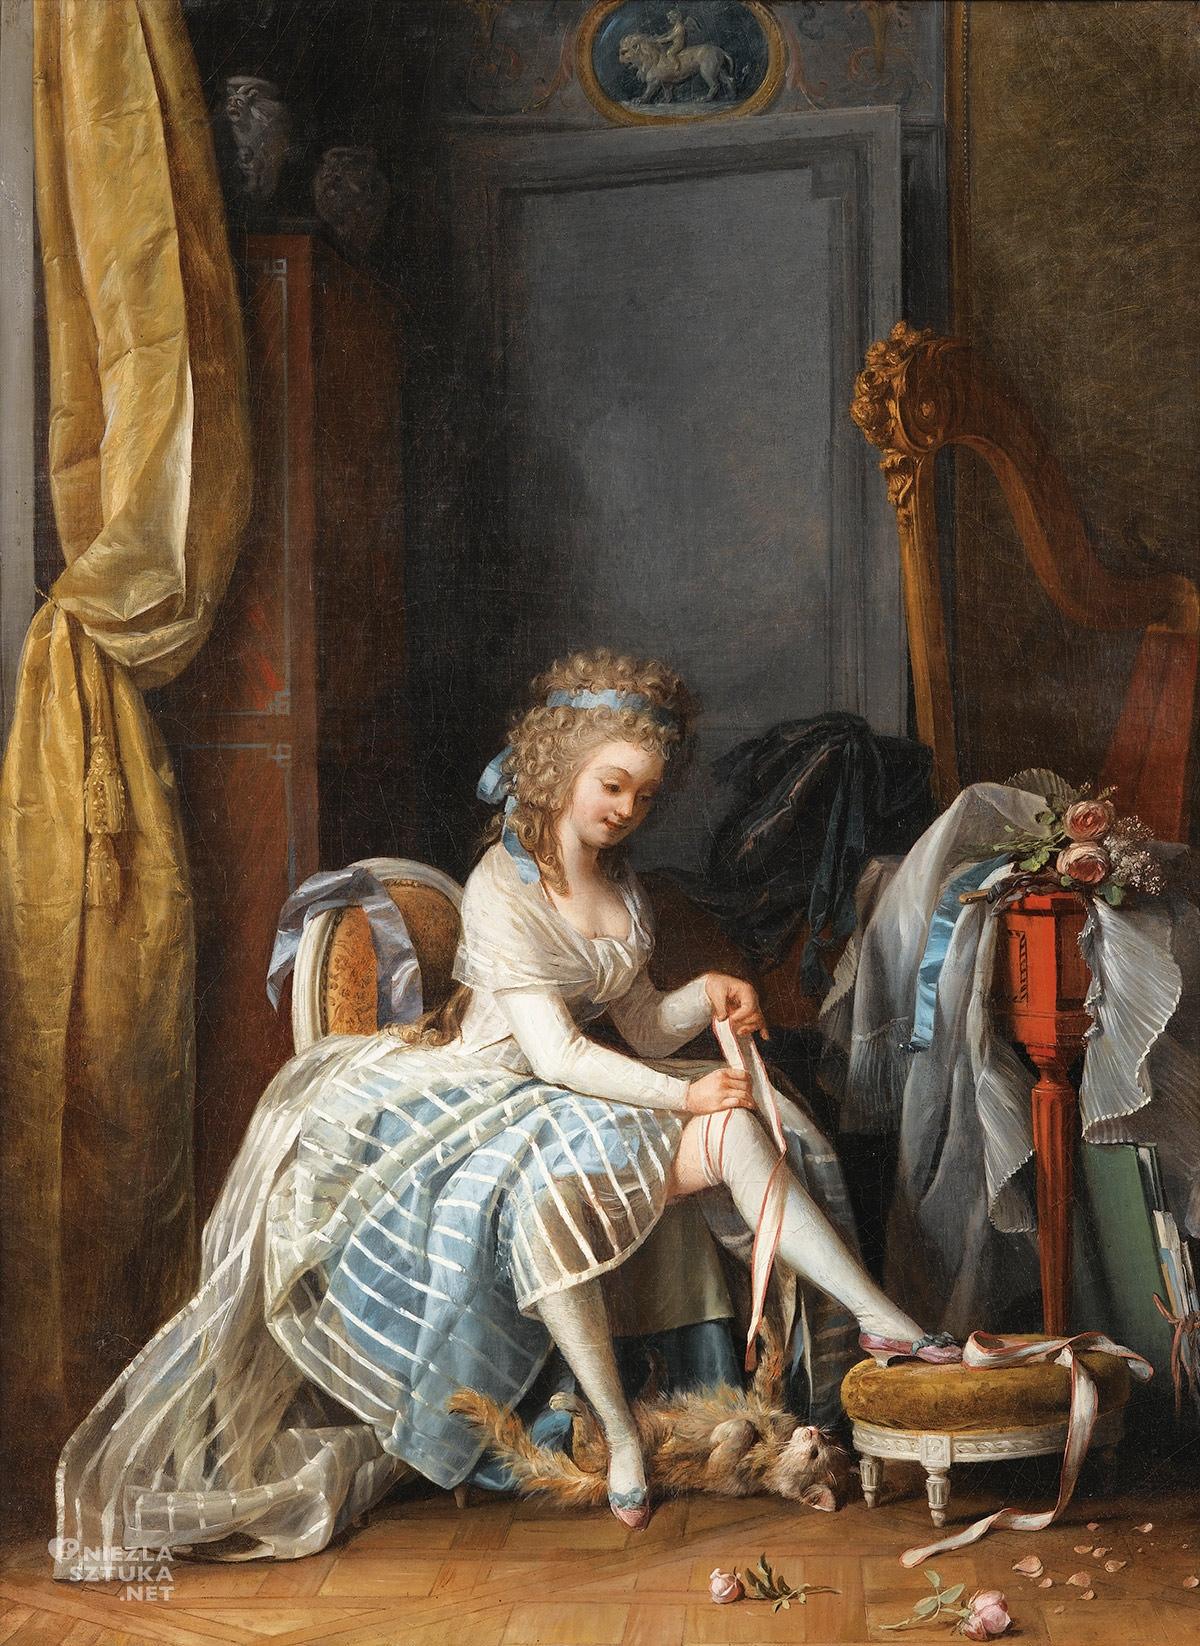 Niklas Lafrensen, malarstwo francuskie, rokoko, moda, Niezła sztuka